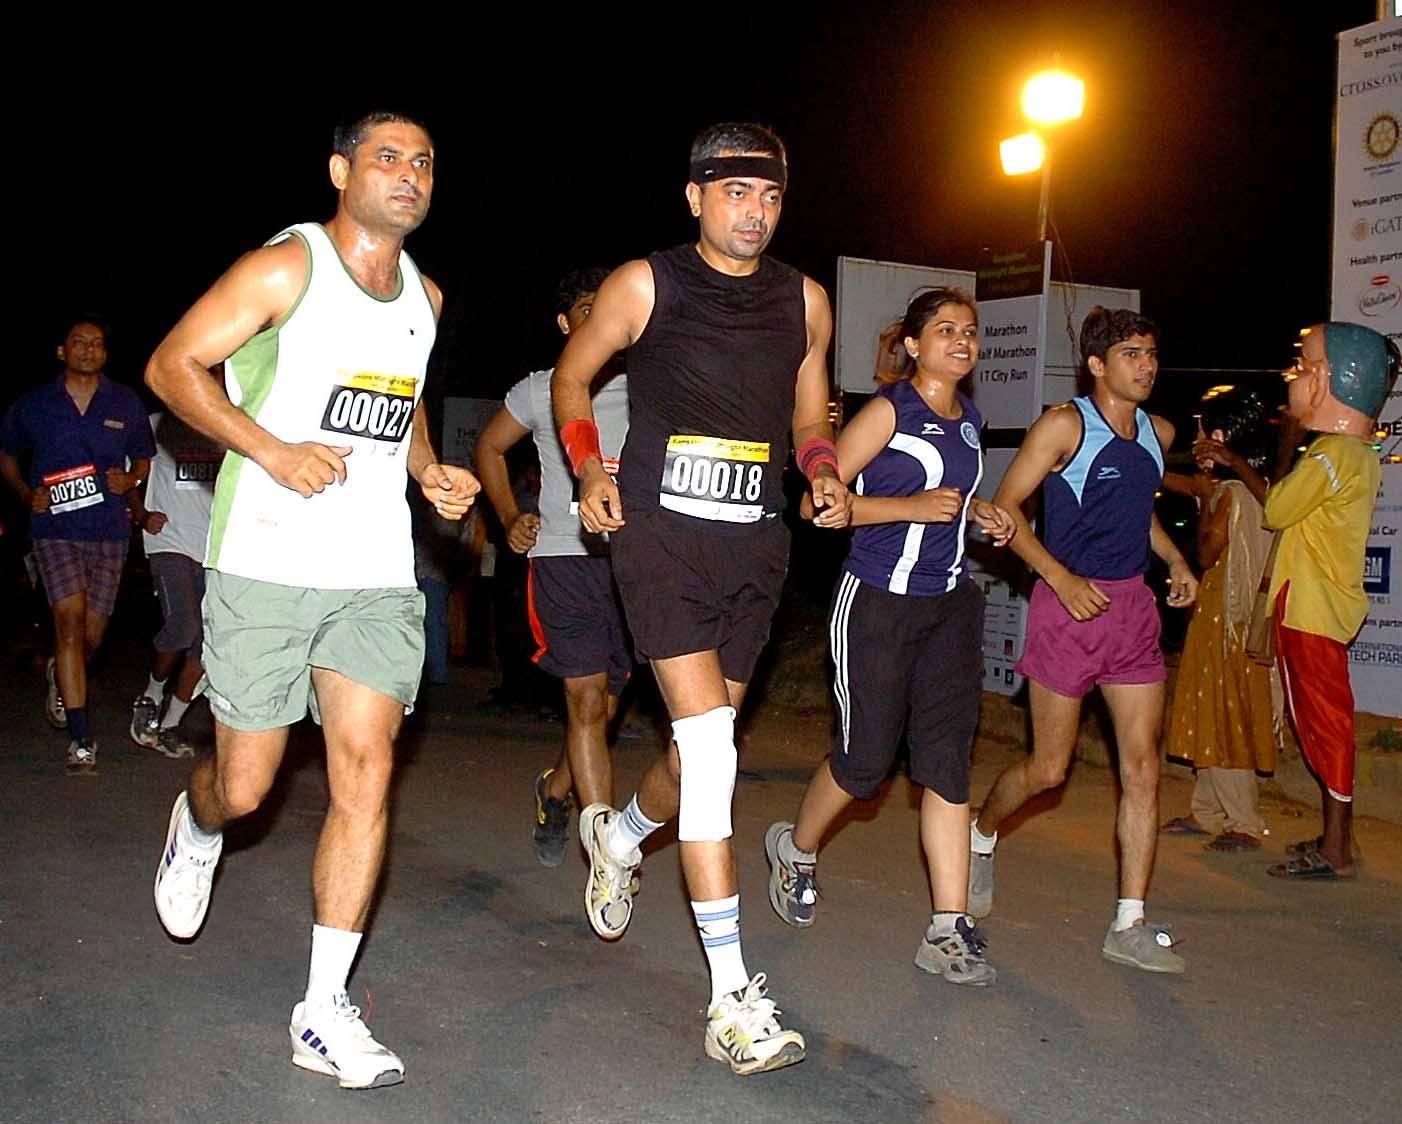 Marathon at night